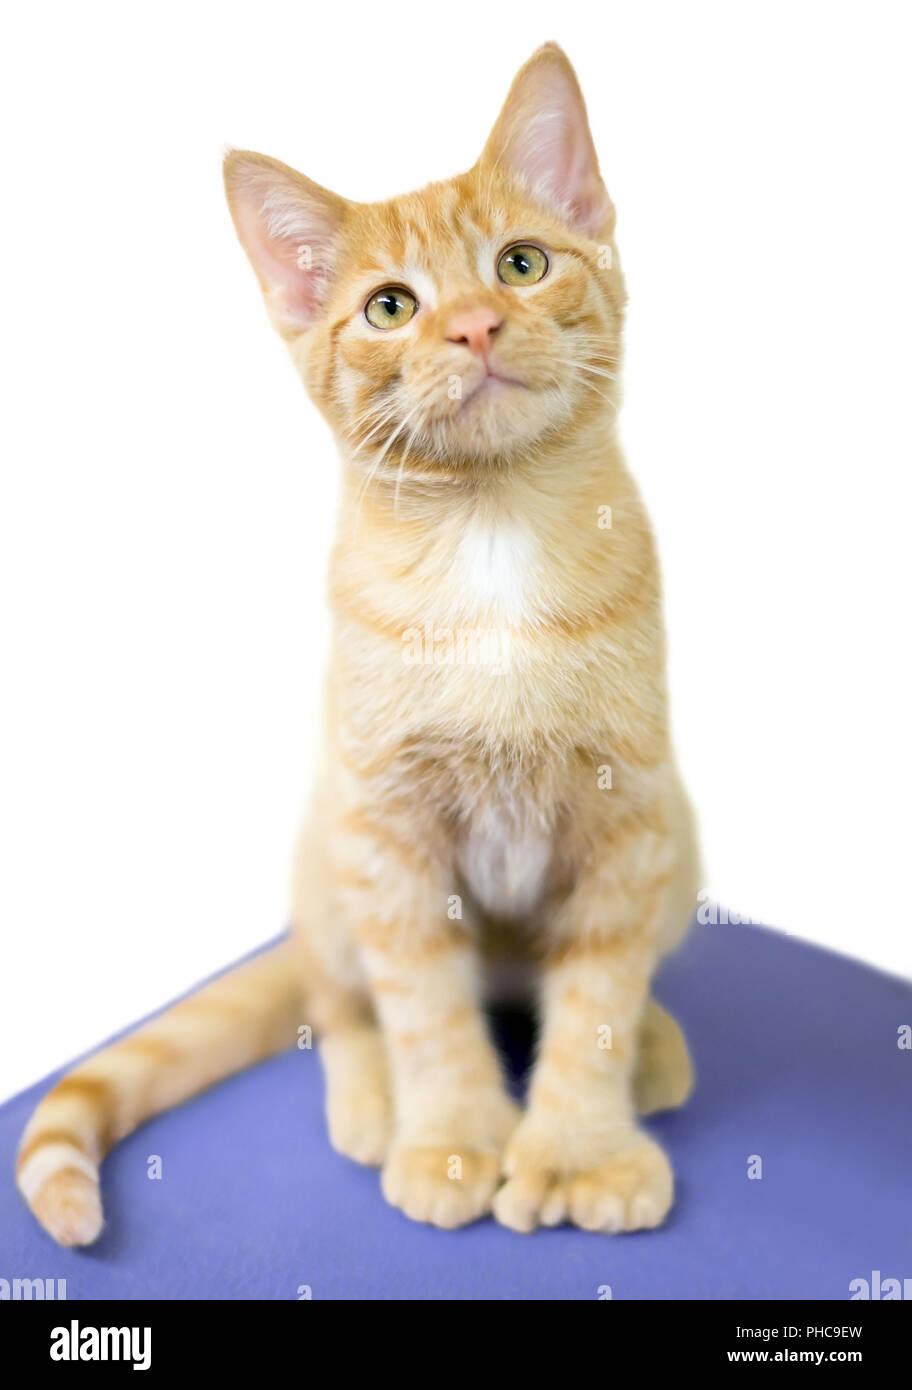 Polydactyl Cat Stock Photos & Polydactyl Cat Stock Images ...  Polydactyl Cat ...